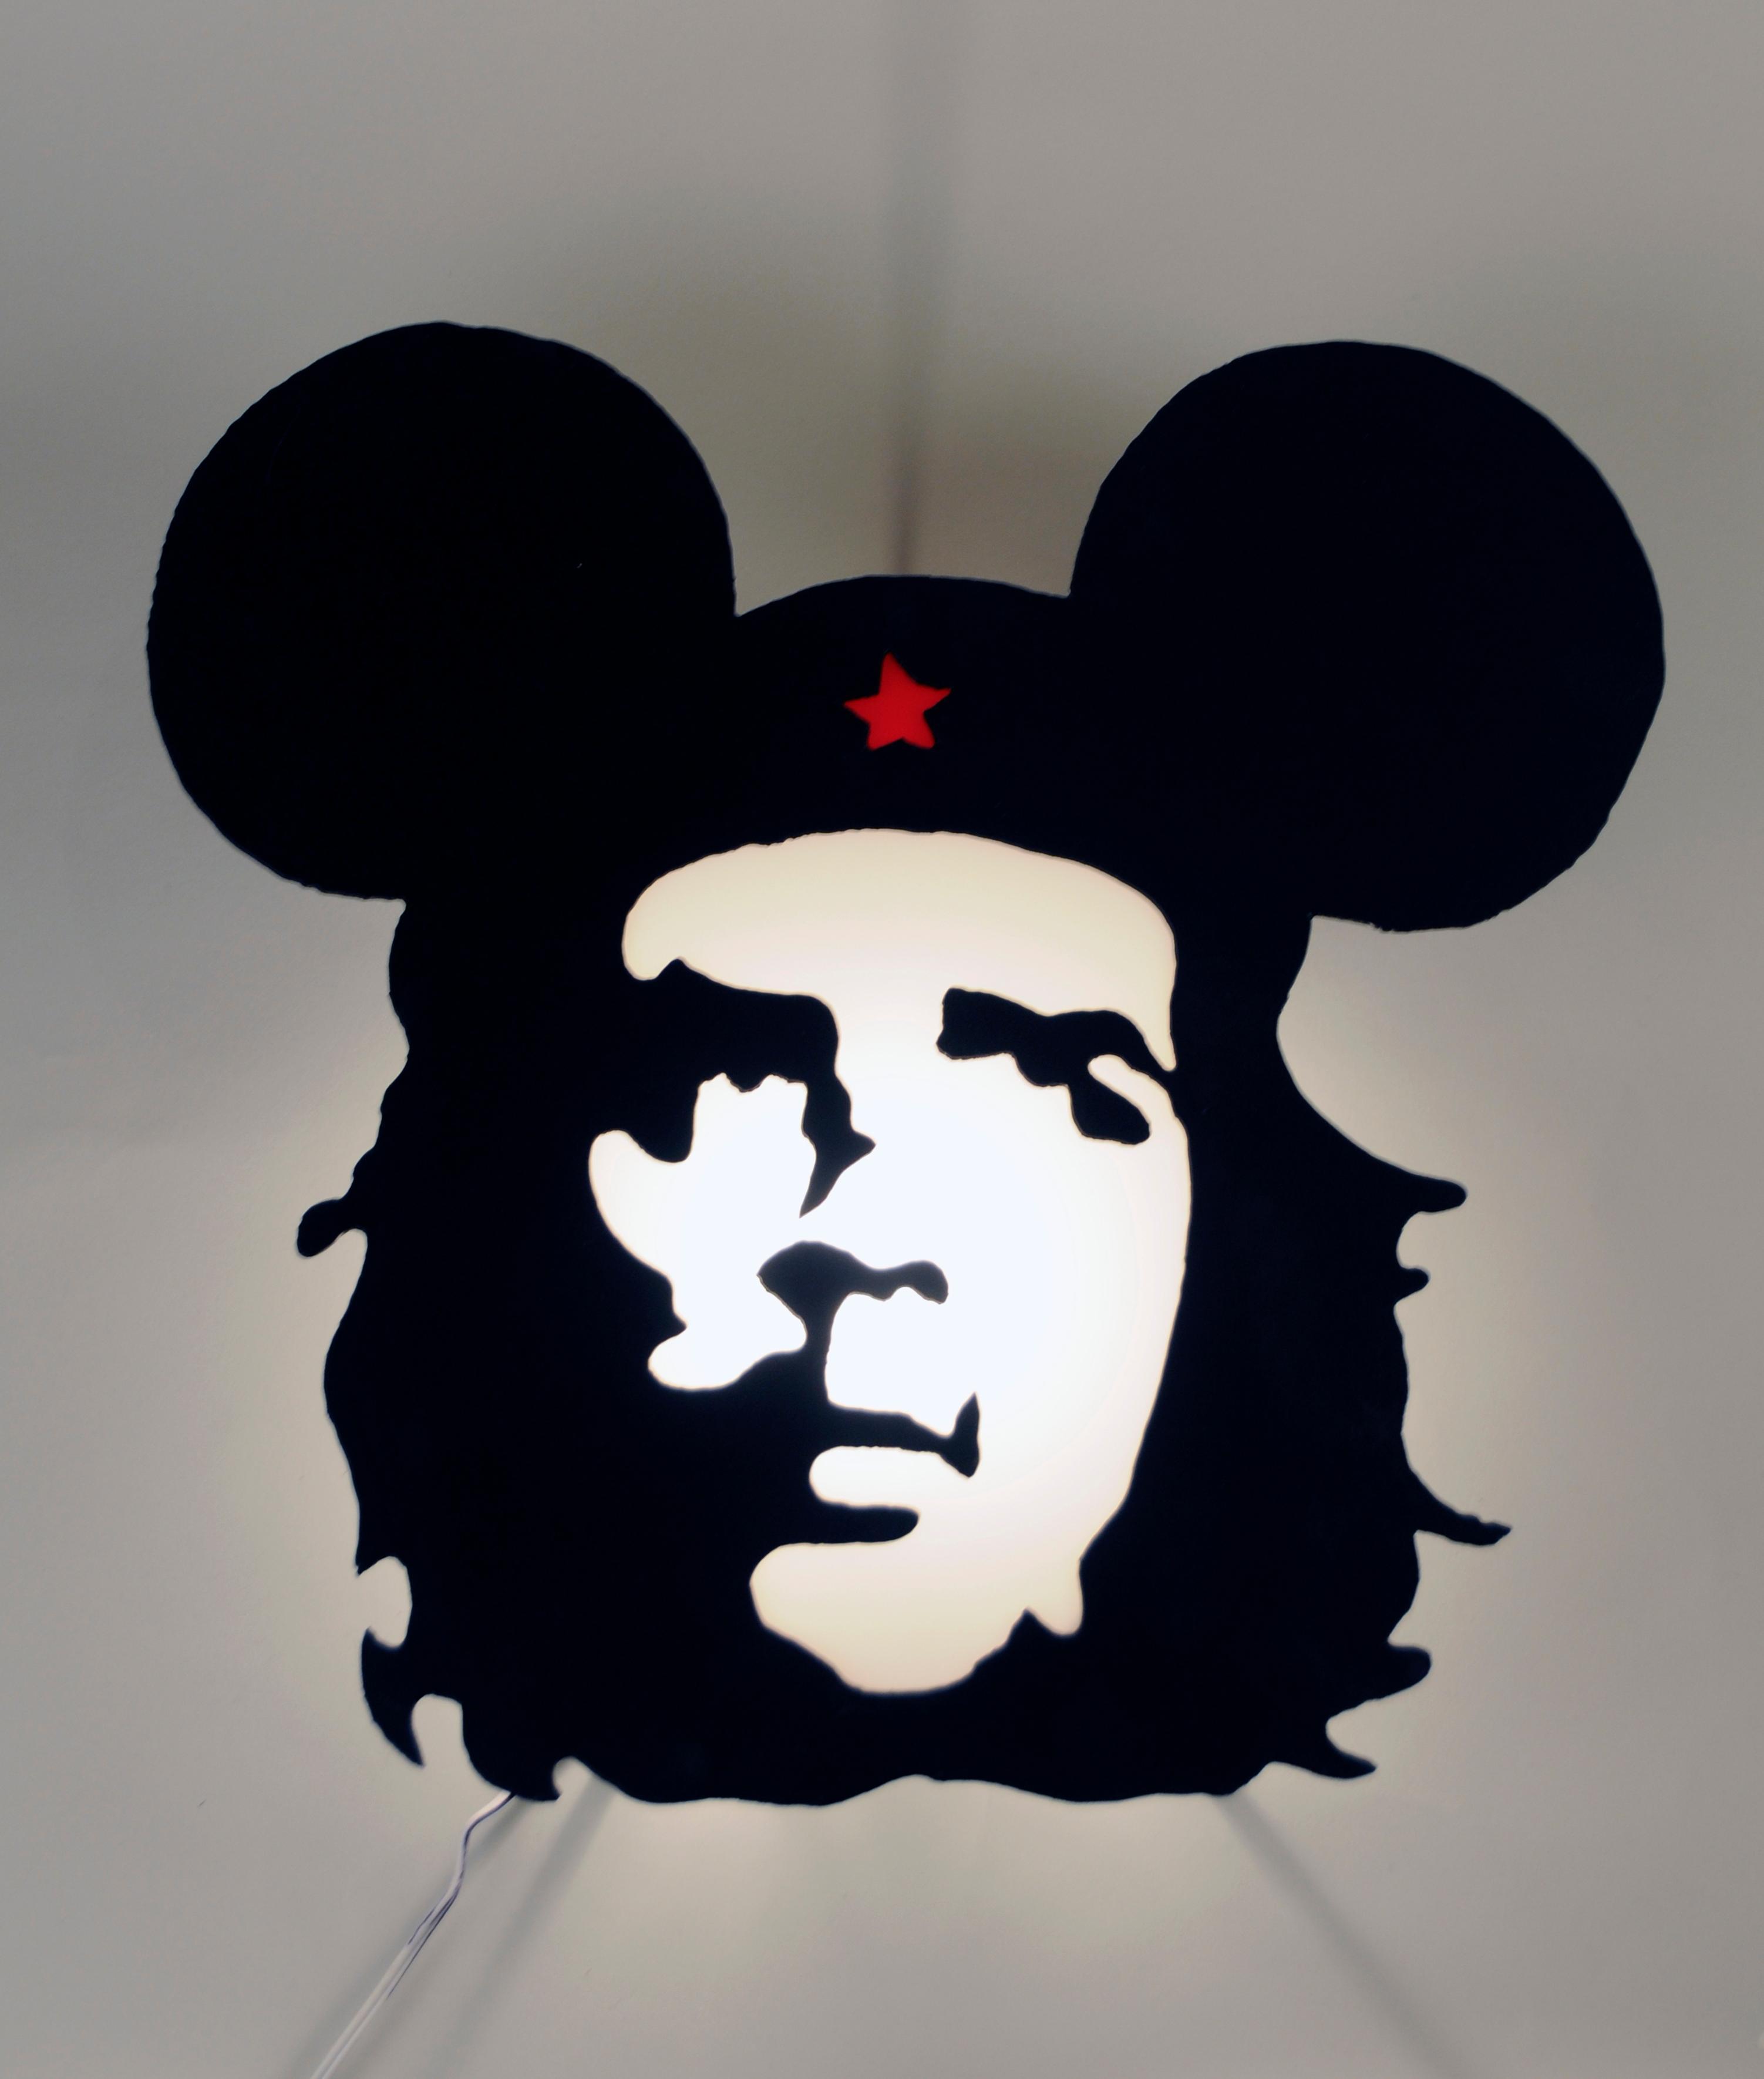 Che Guevara as Mickey Mouse